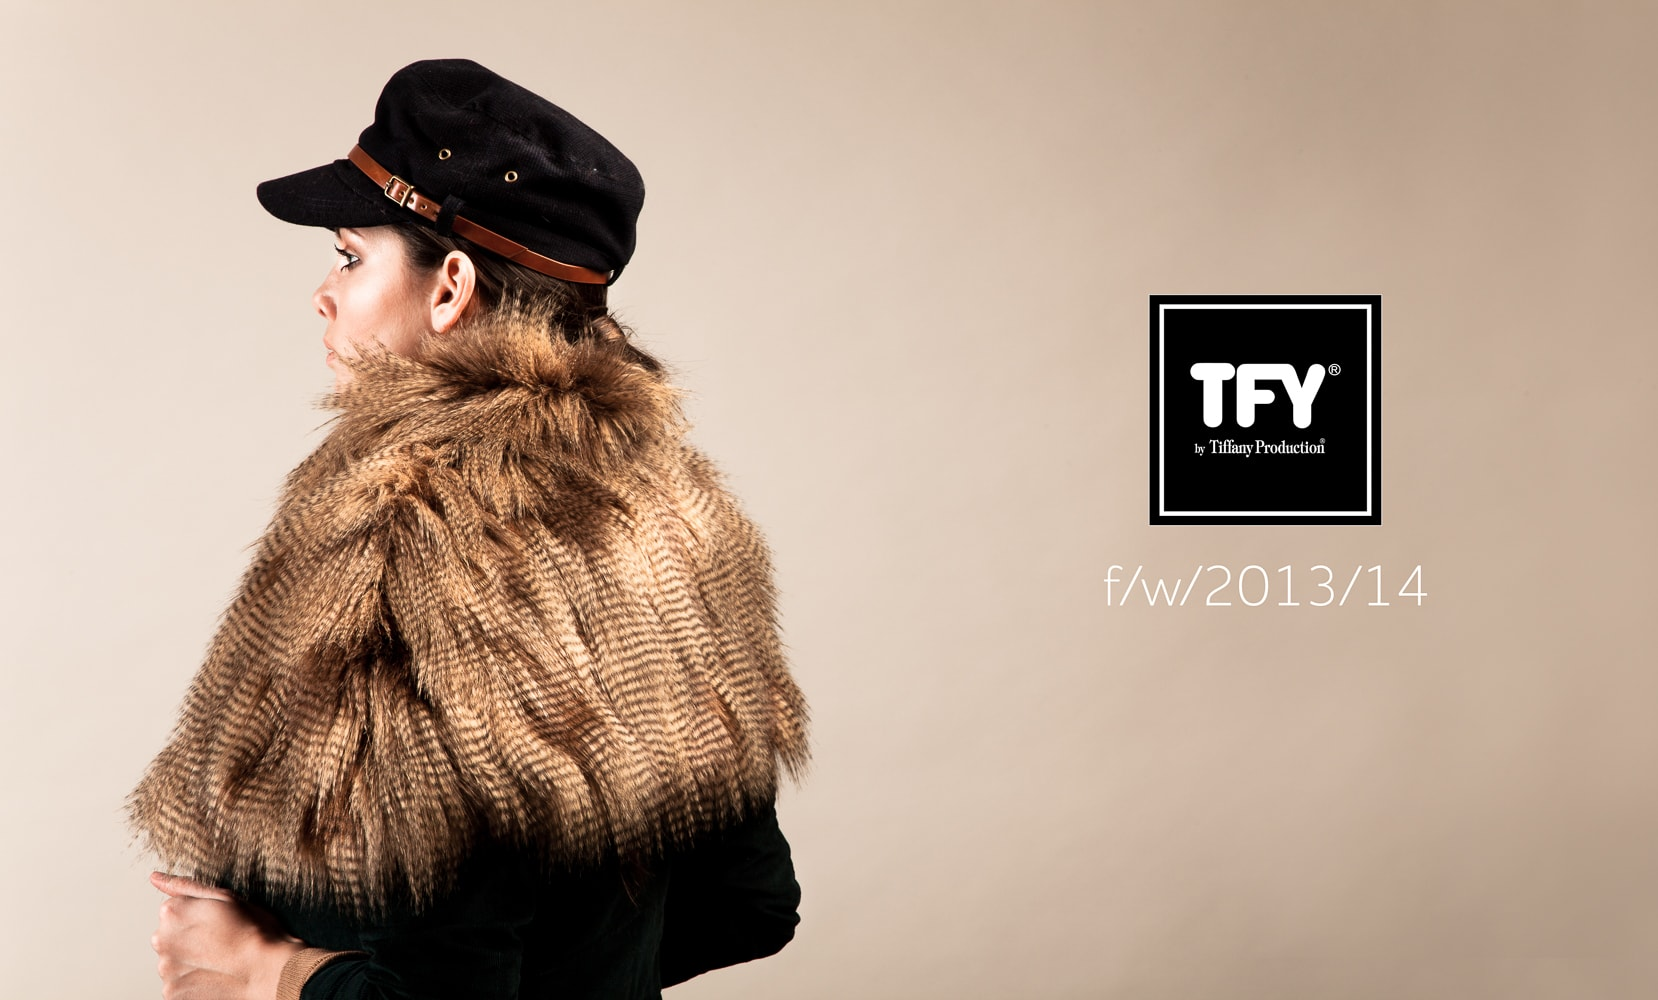 TFY FW14